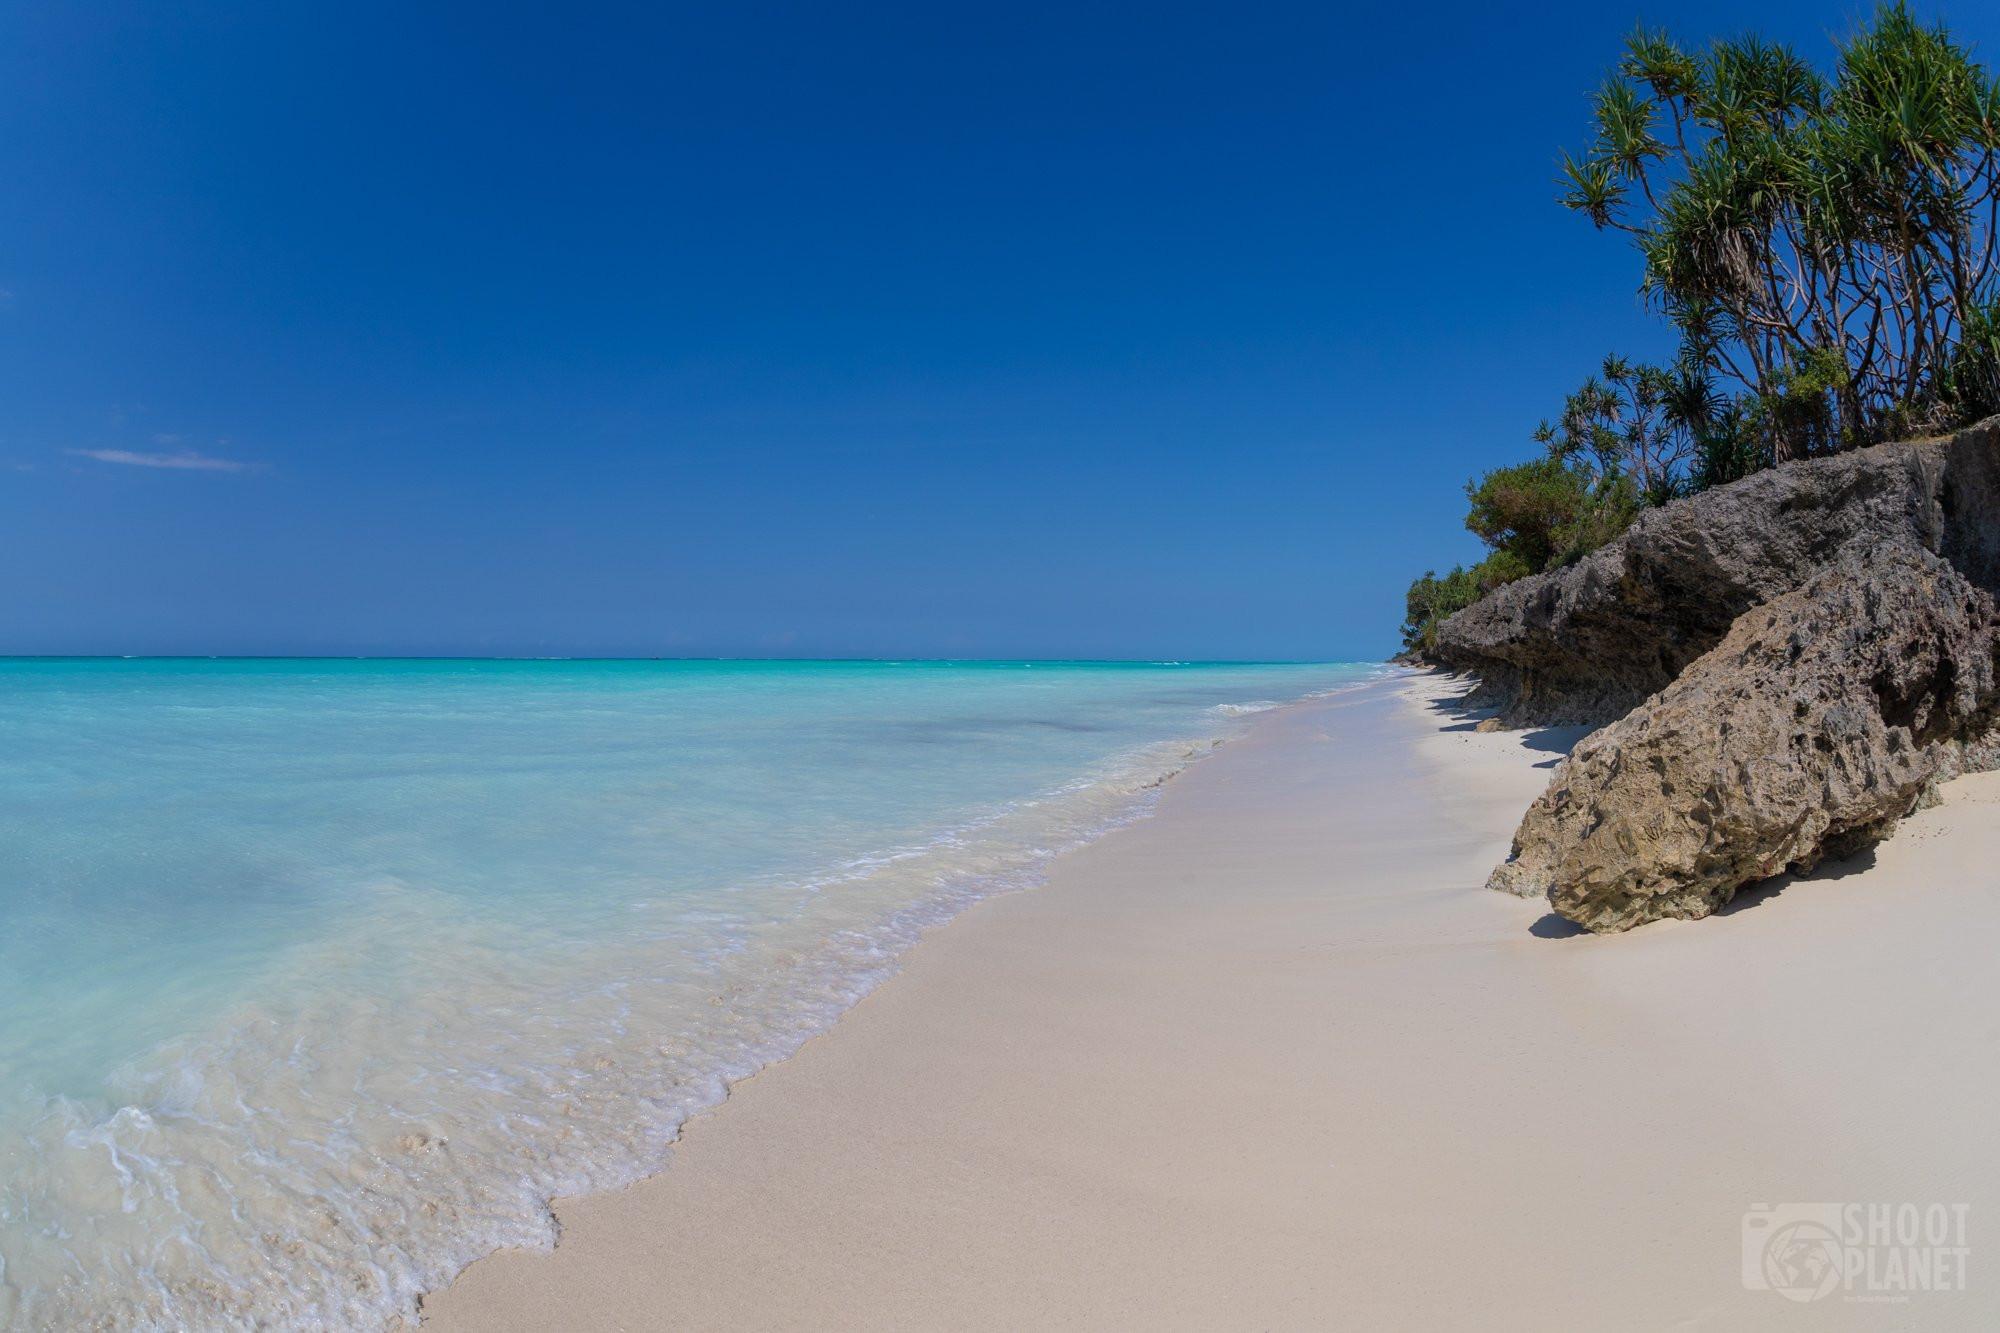 Ras Nungwi beach, Zanzibar Tanzania